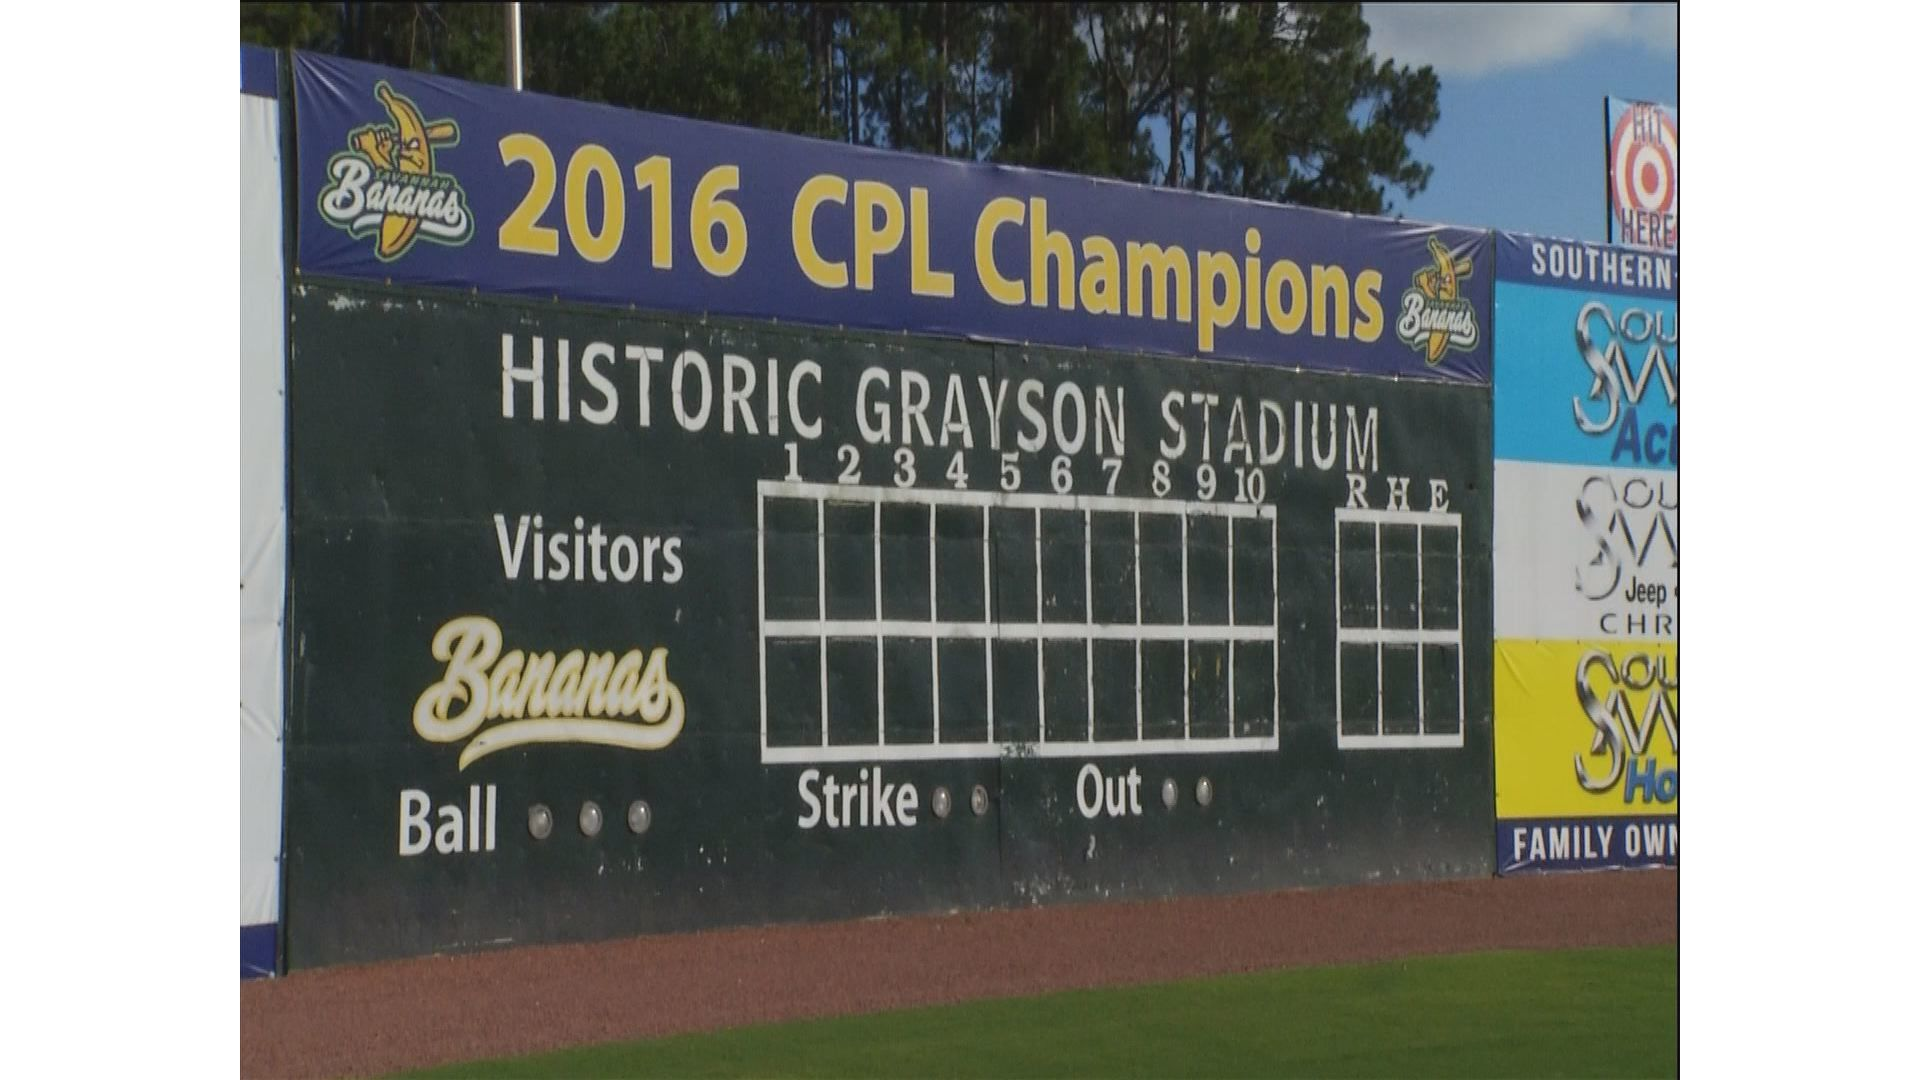 Life Behind The Grayson Stadium Scoreboard